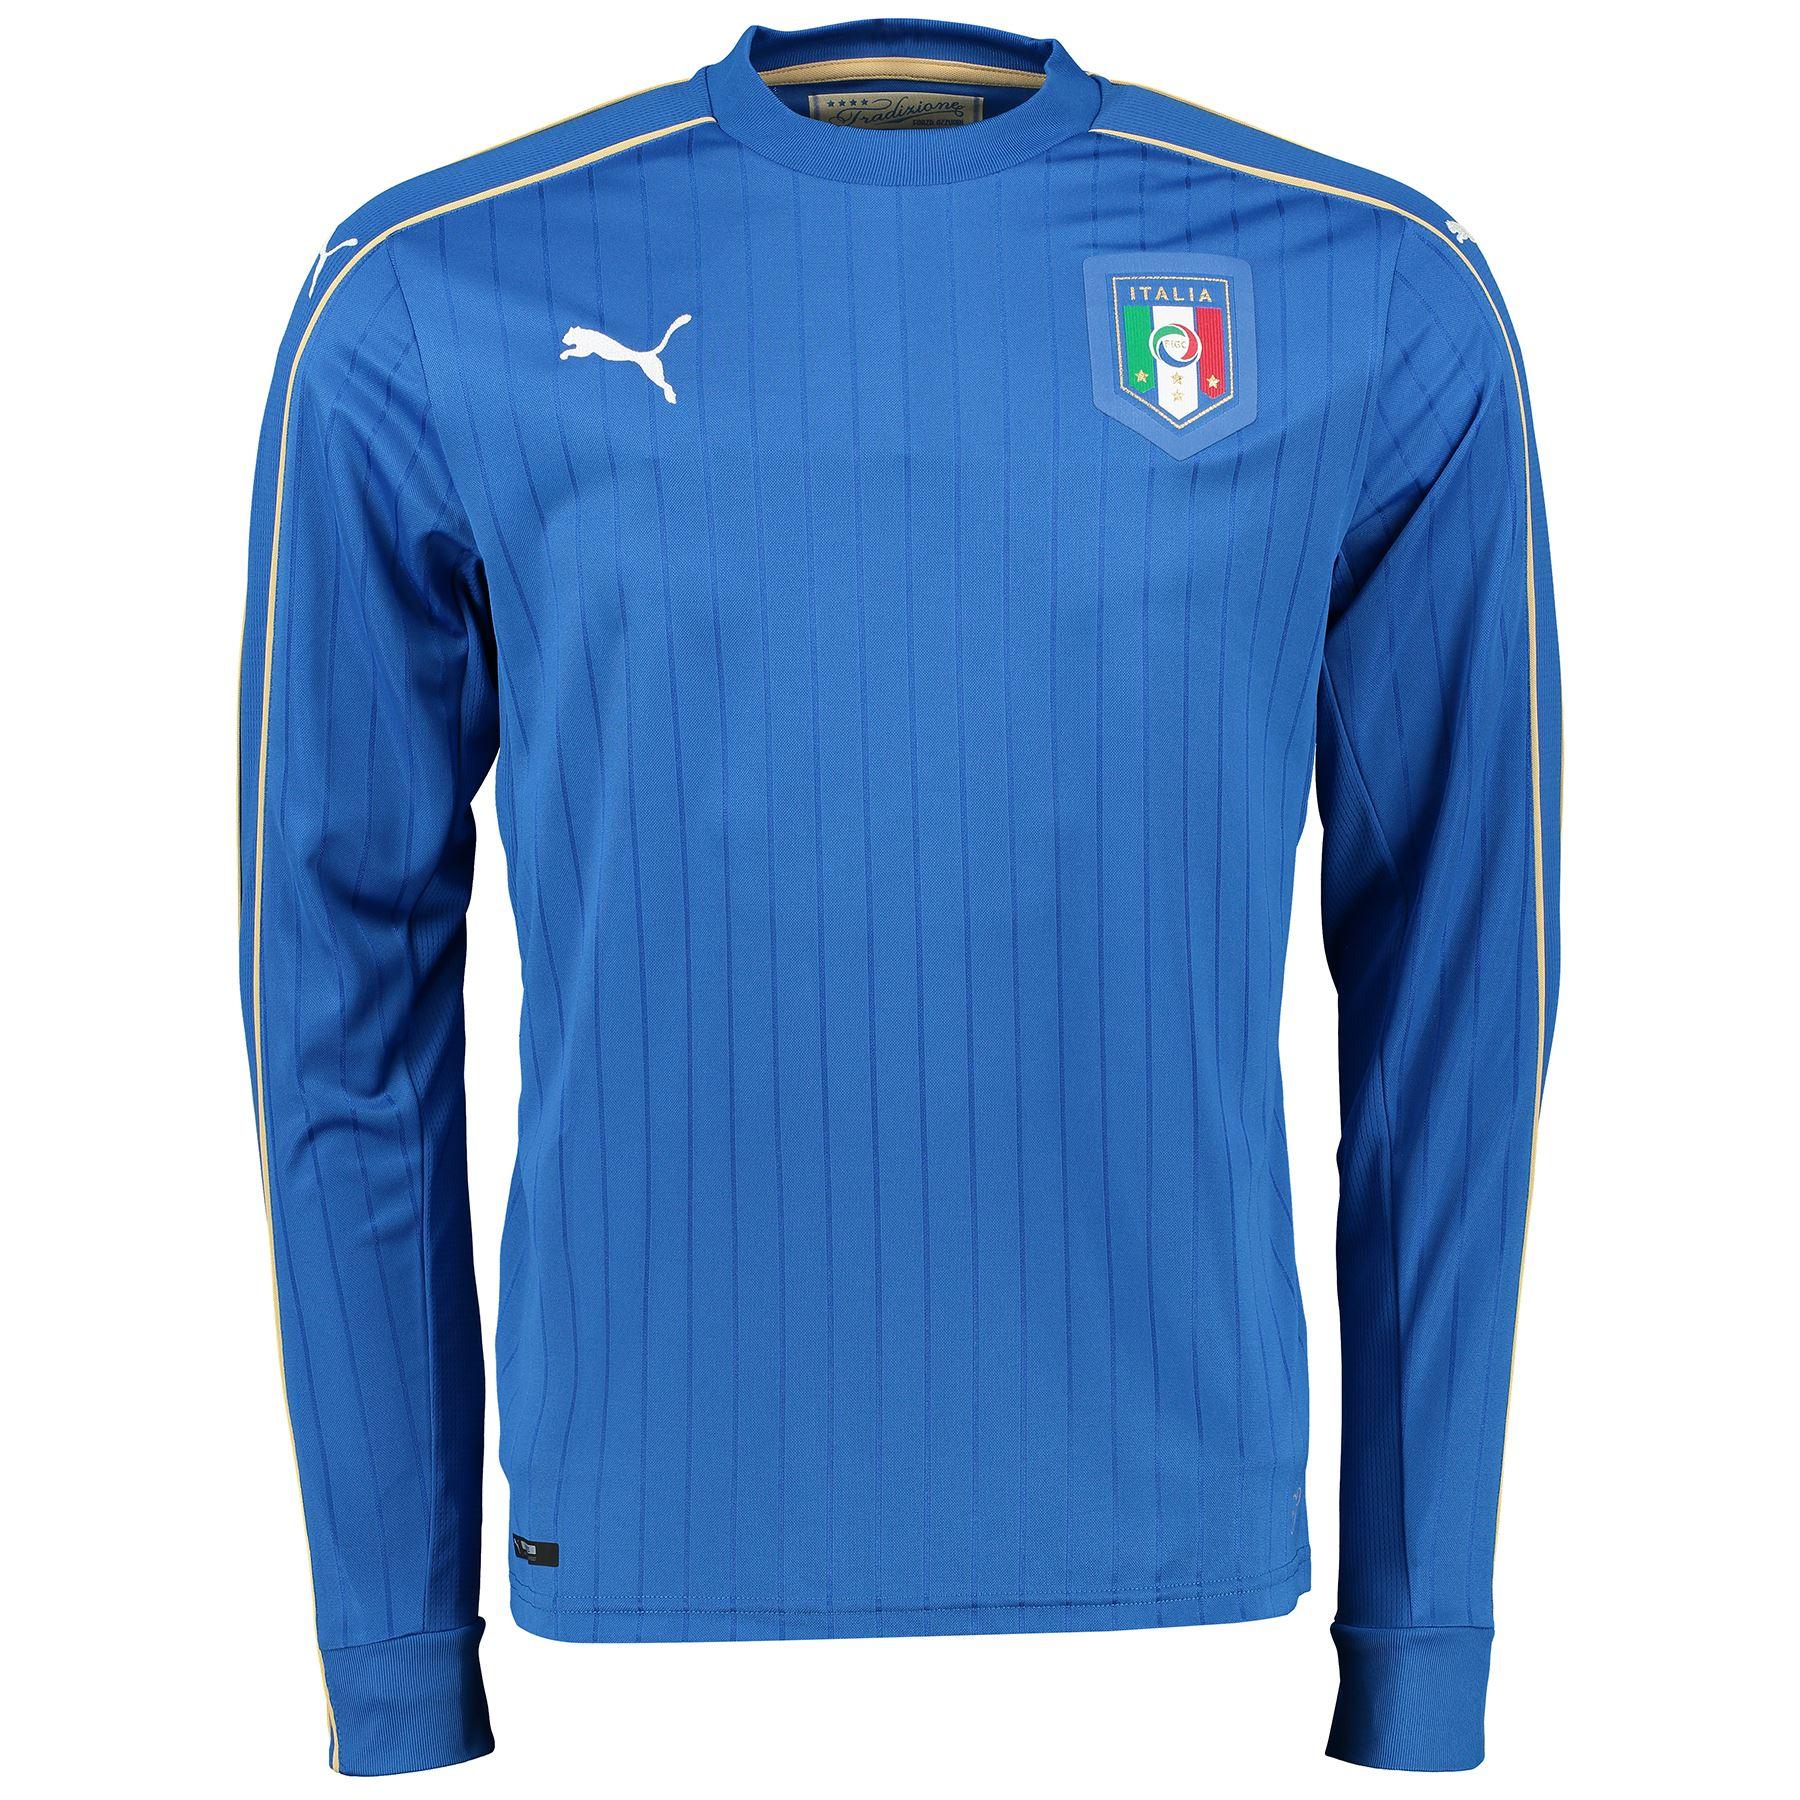 Puma Teamwear - Puma Striped Long Sleeve Football Shirt ... |Cool Puma Soccer Shirts